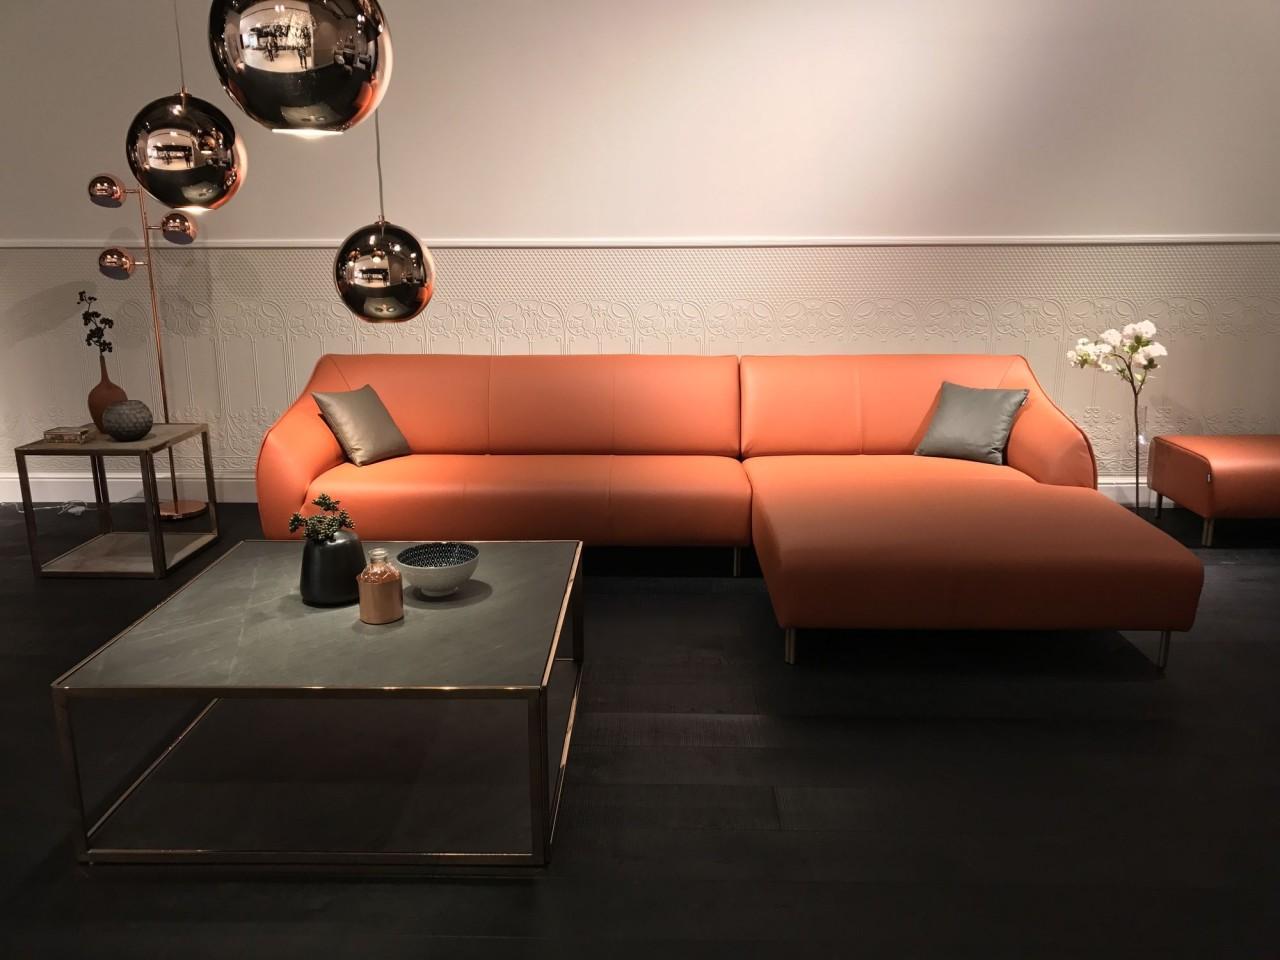 Full Size of Freistil Sofa Couch Rolf Benz 141 180 165 By Dreieinhalbsitzer Sofa Preis 132 Mit Recamiere Im Edlen Nappa Leder Lagerverkauf Höffner Big Lila 3 Sitzer Leinen Sofa Freistil Sofa